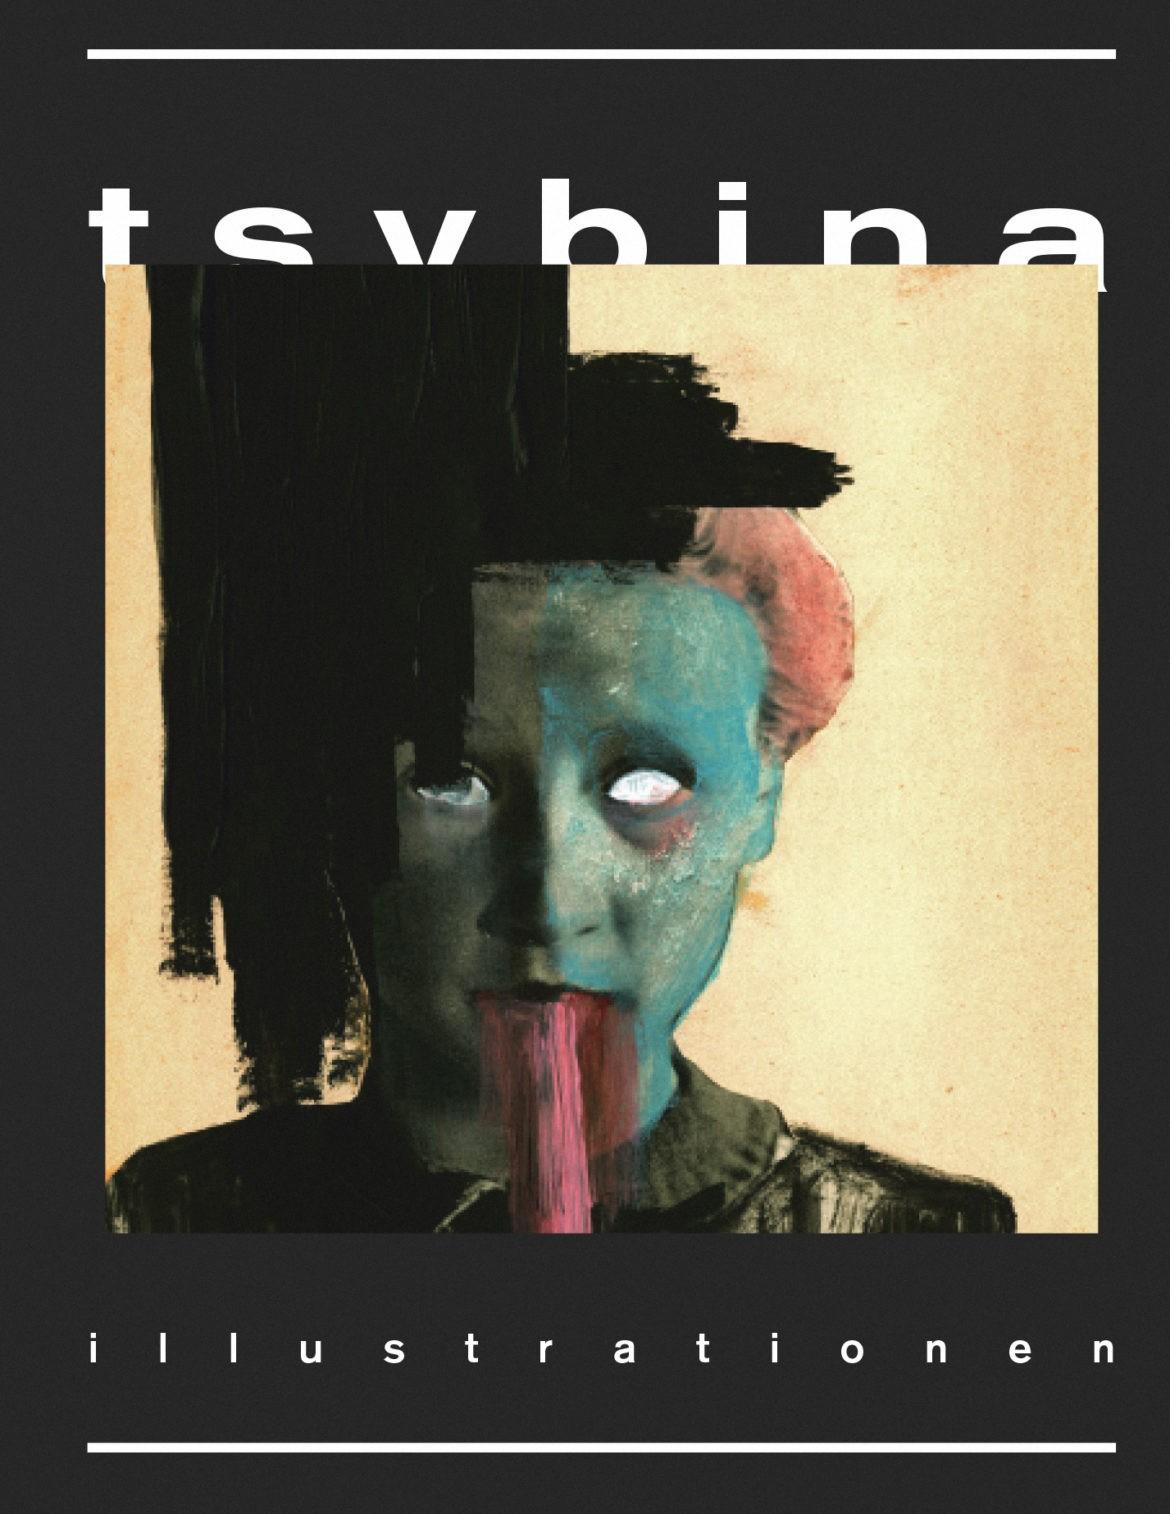 Cover   Broschüre   Portfolio   Künstlerin   Illustrationen